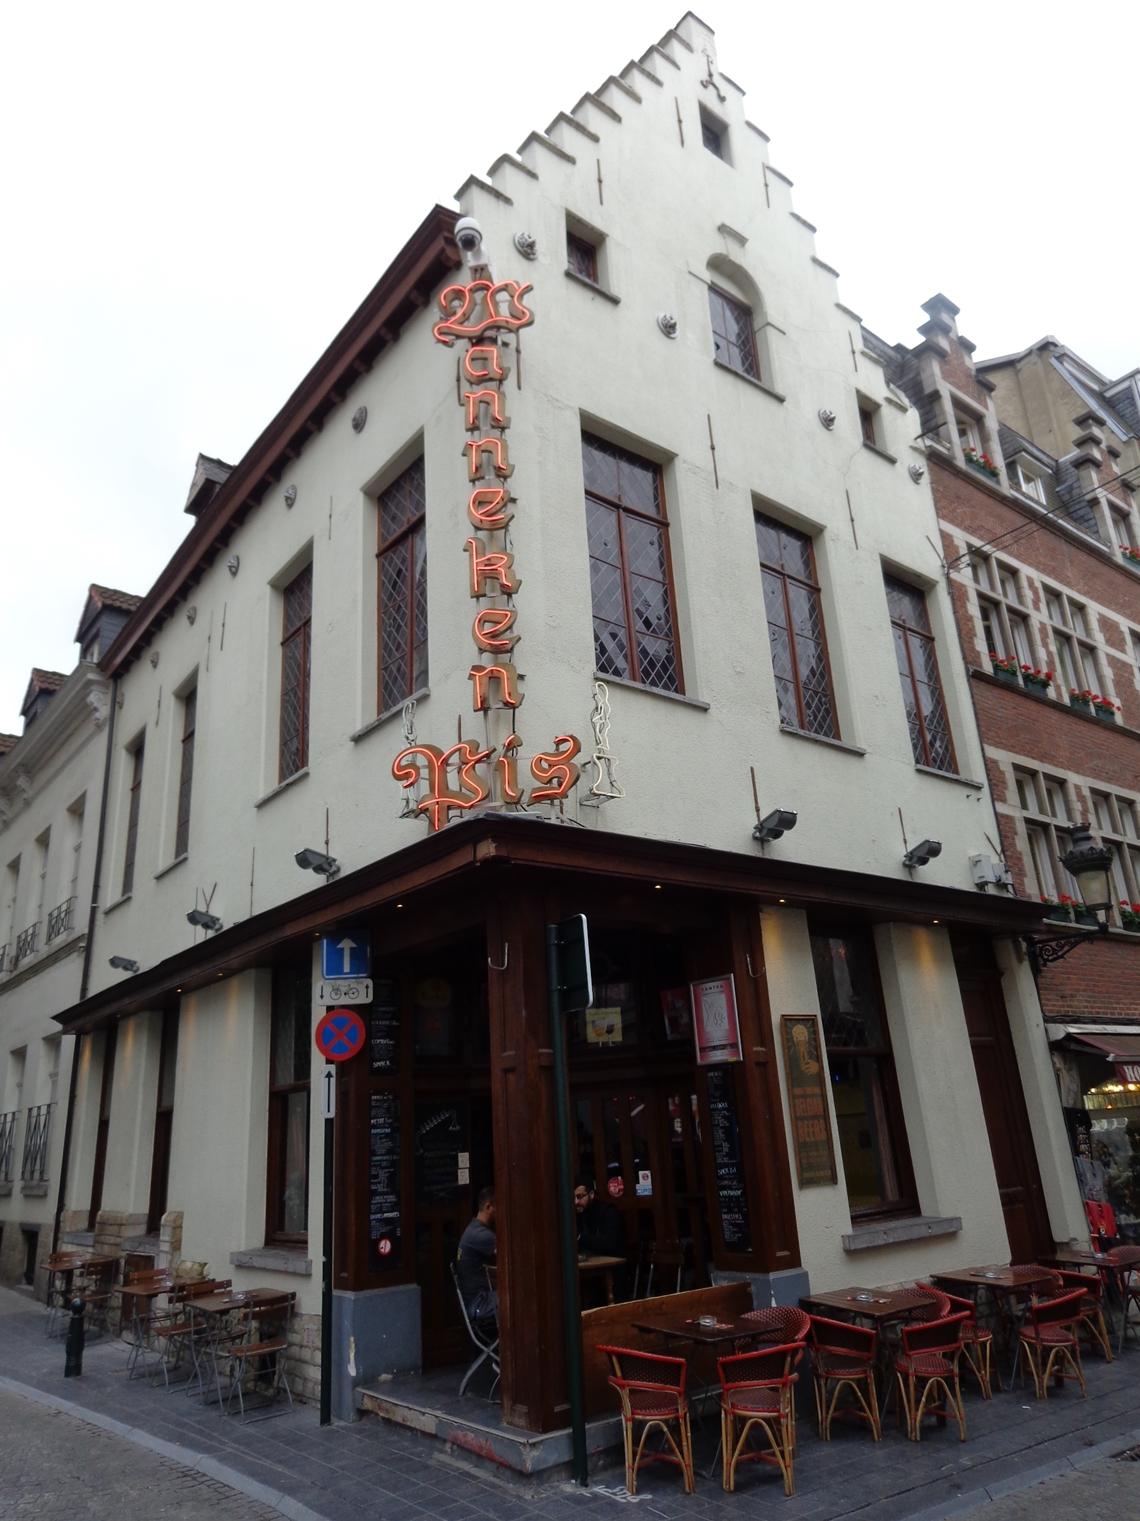 Lievevrouwbroersstraat 31-33, 2015